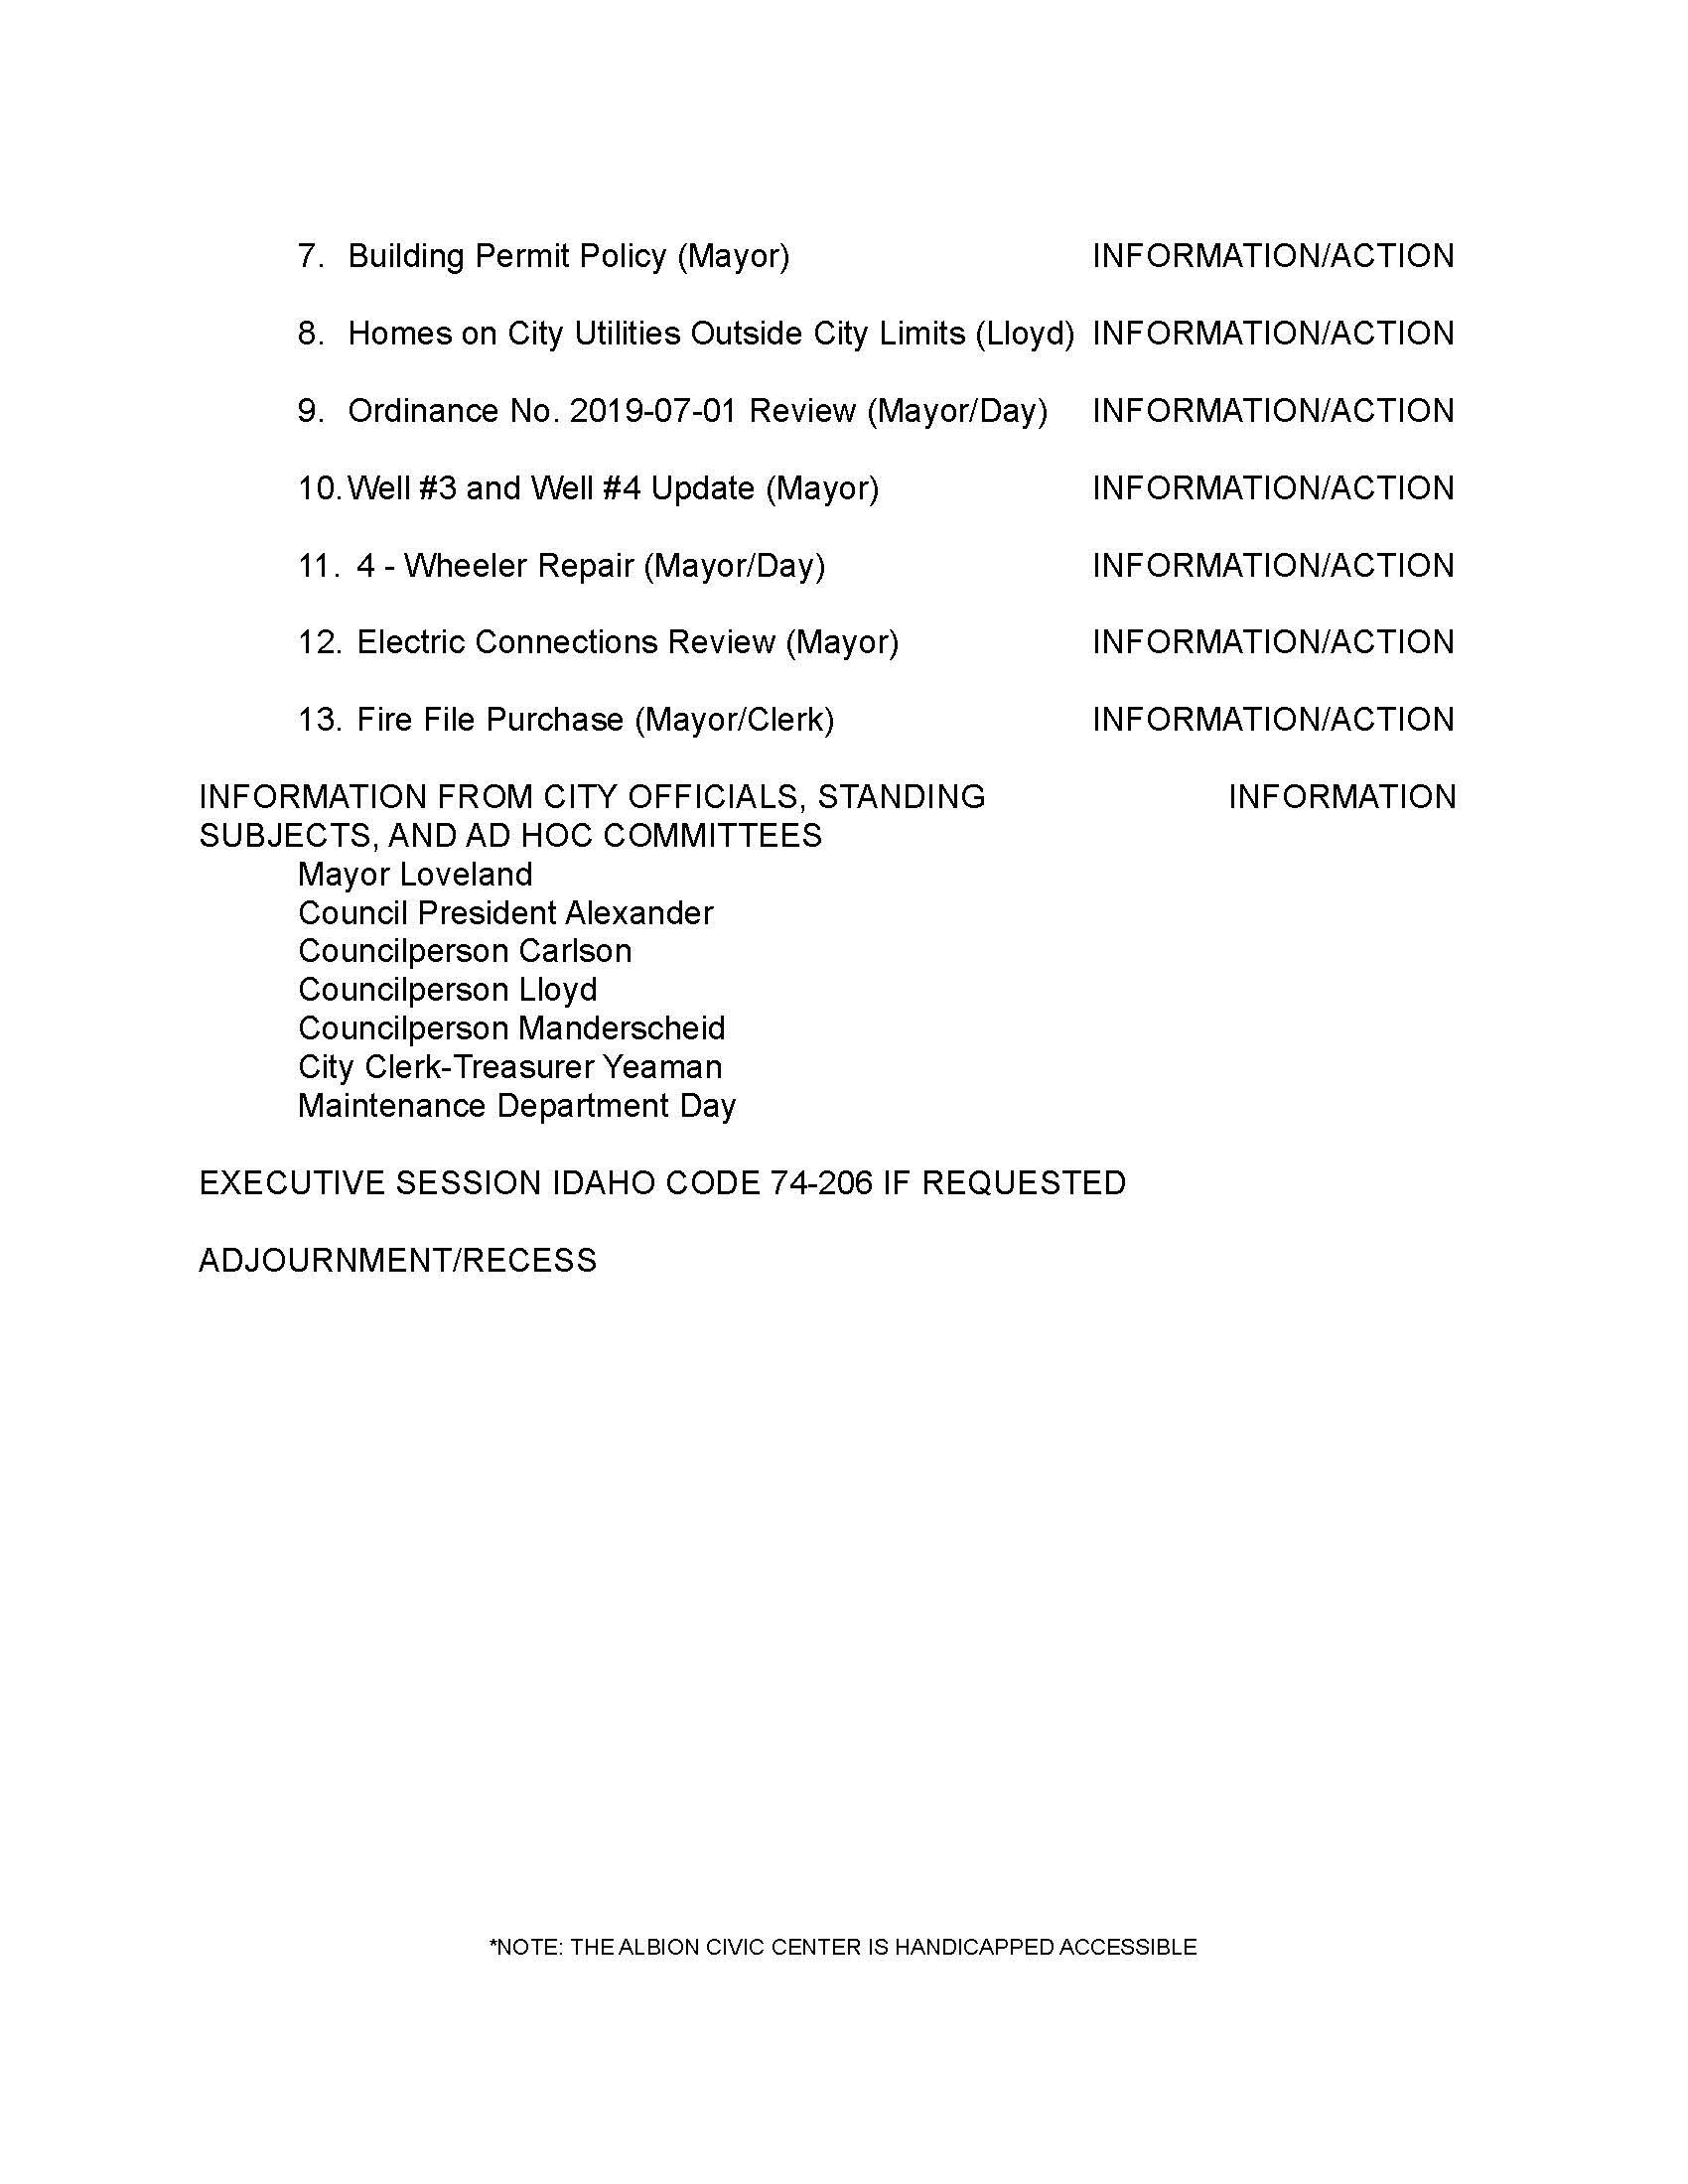 Agenda 08.06_Page_2.jpg